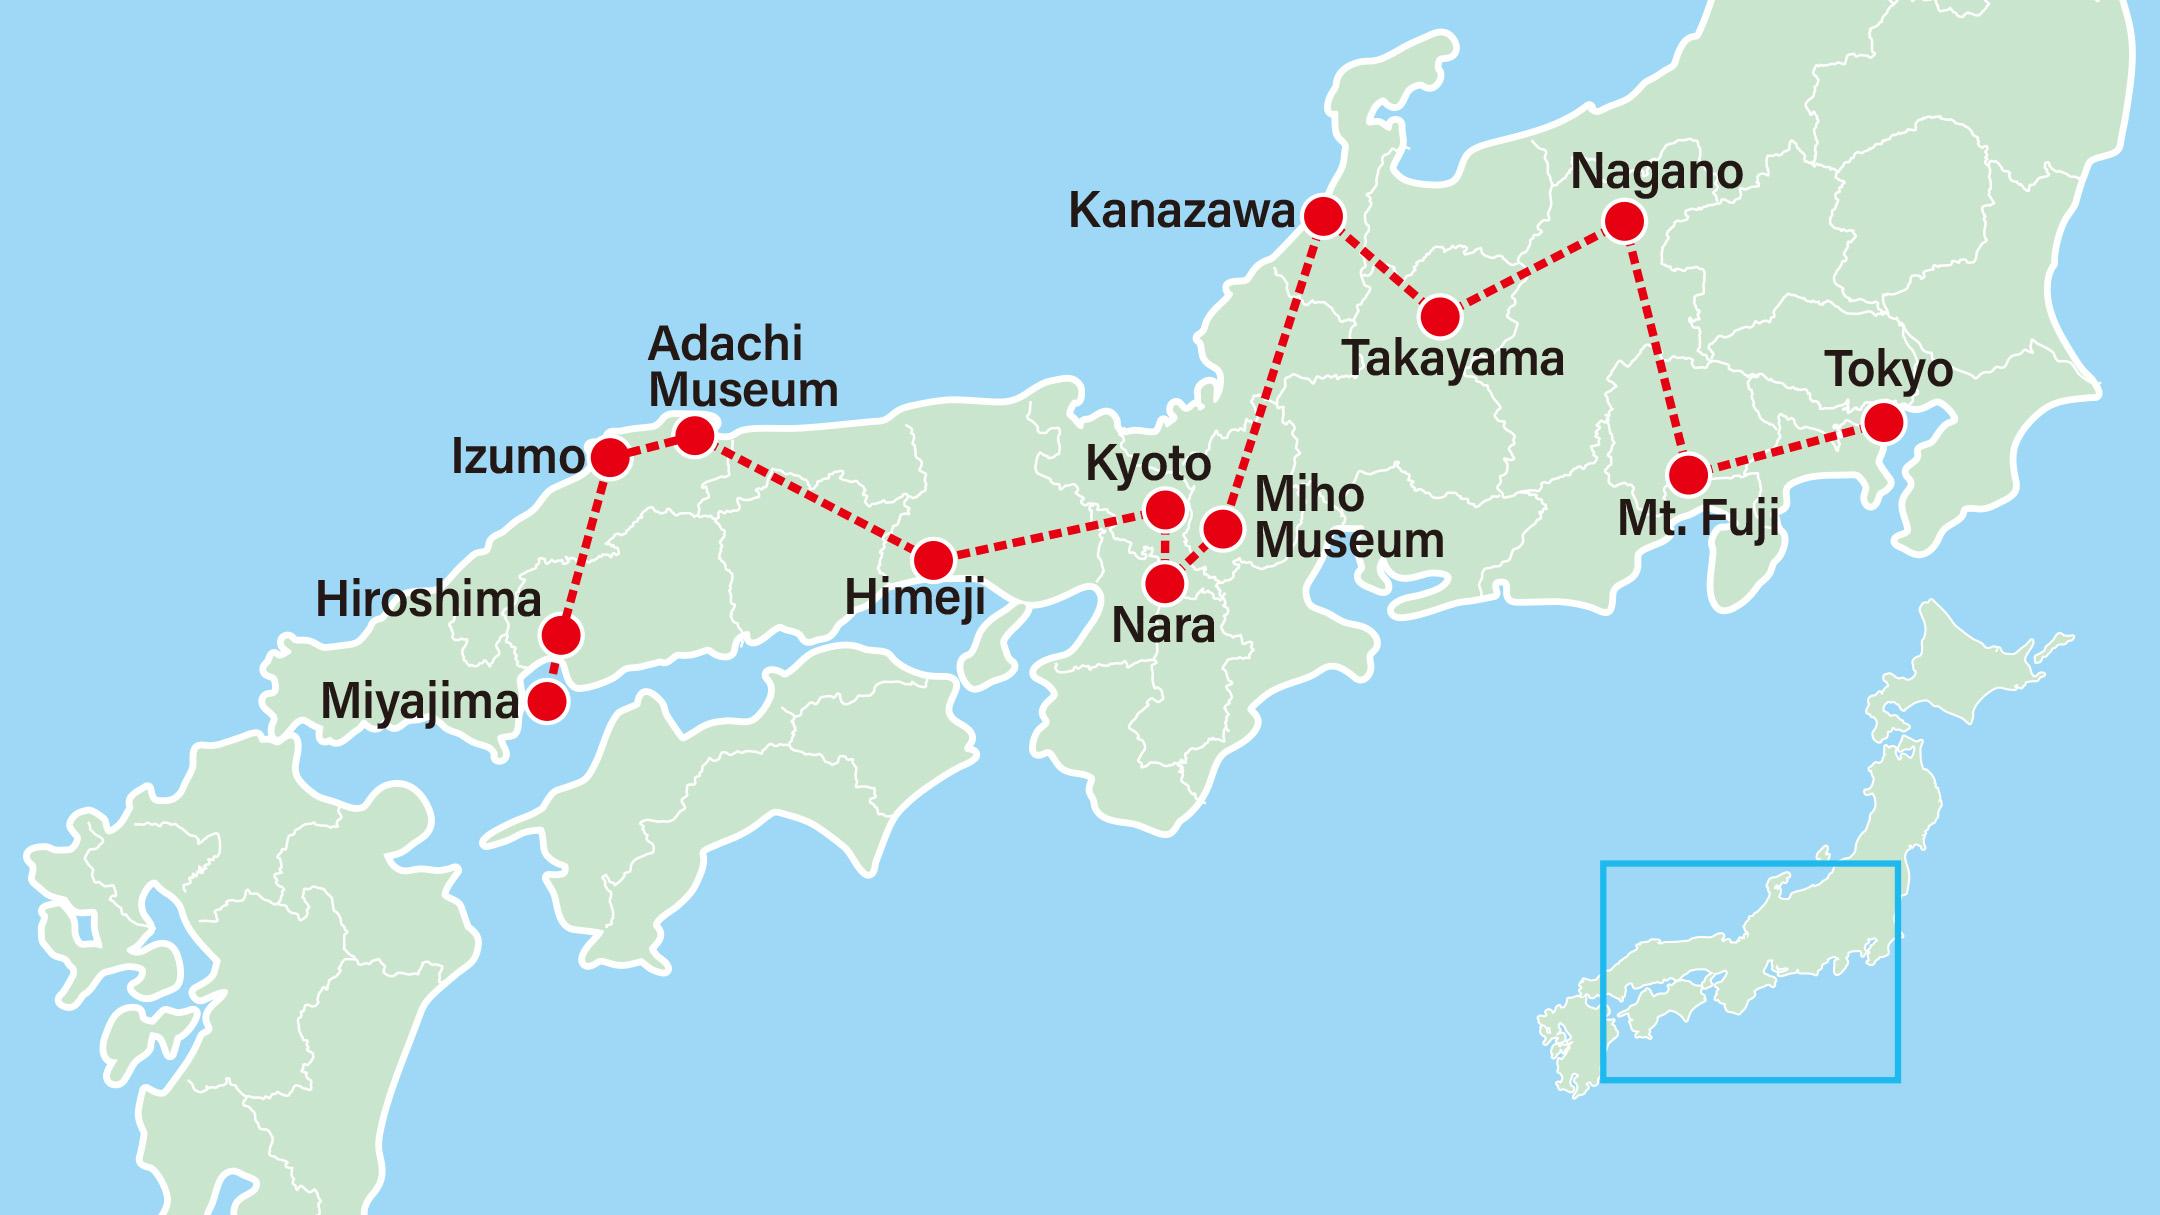 Takayama Old Town & Hiroshima 11 Days-Tokyo-Lake Kawaguchi-Nagano-Takayama-Kanazawa-Miho Museum-Nara-Kyoto-Himeji-Shimane-Hiroshima-Miyajima